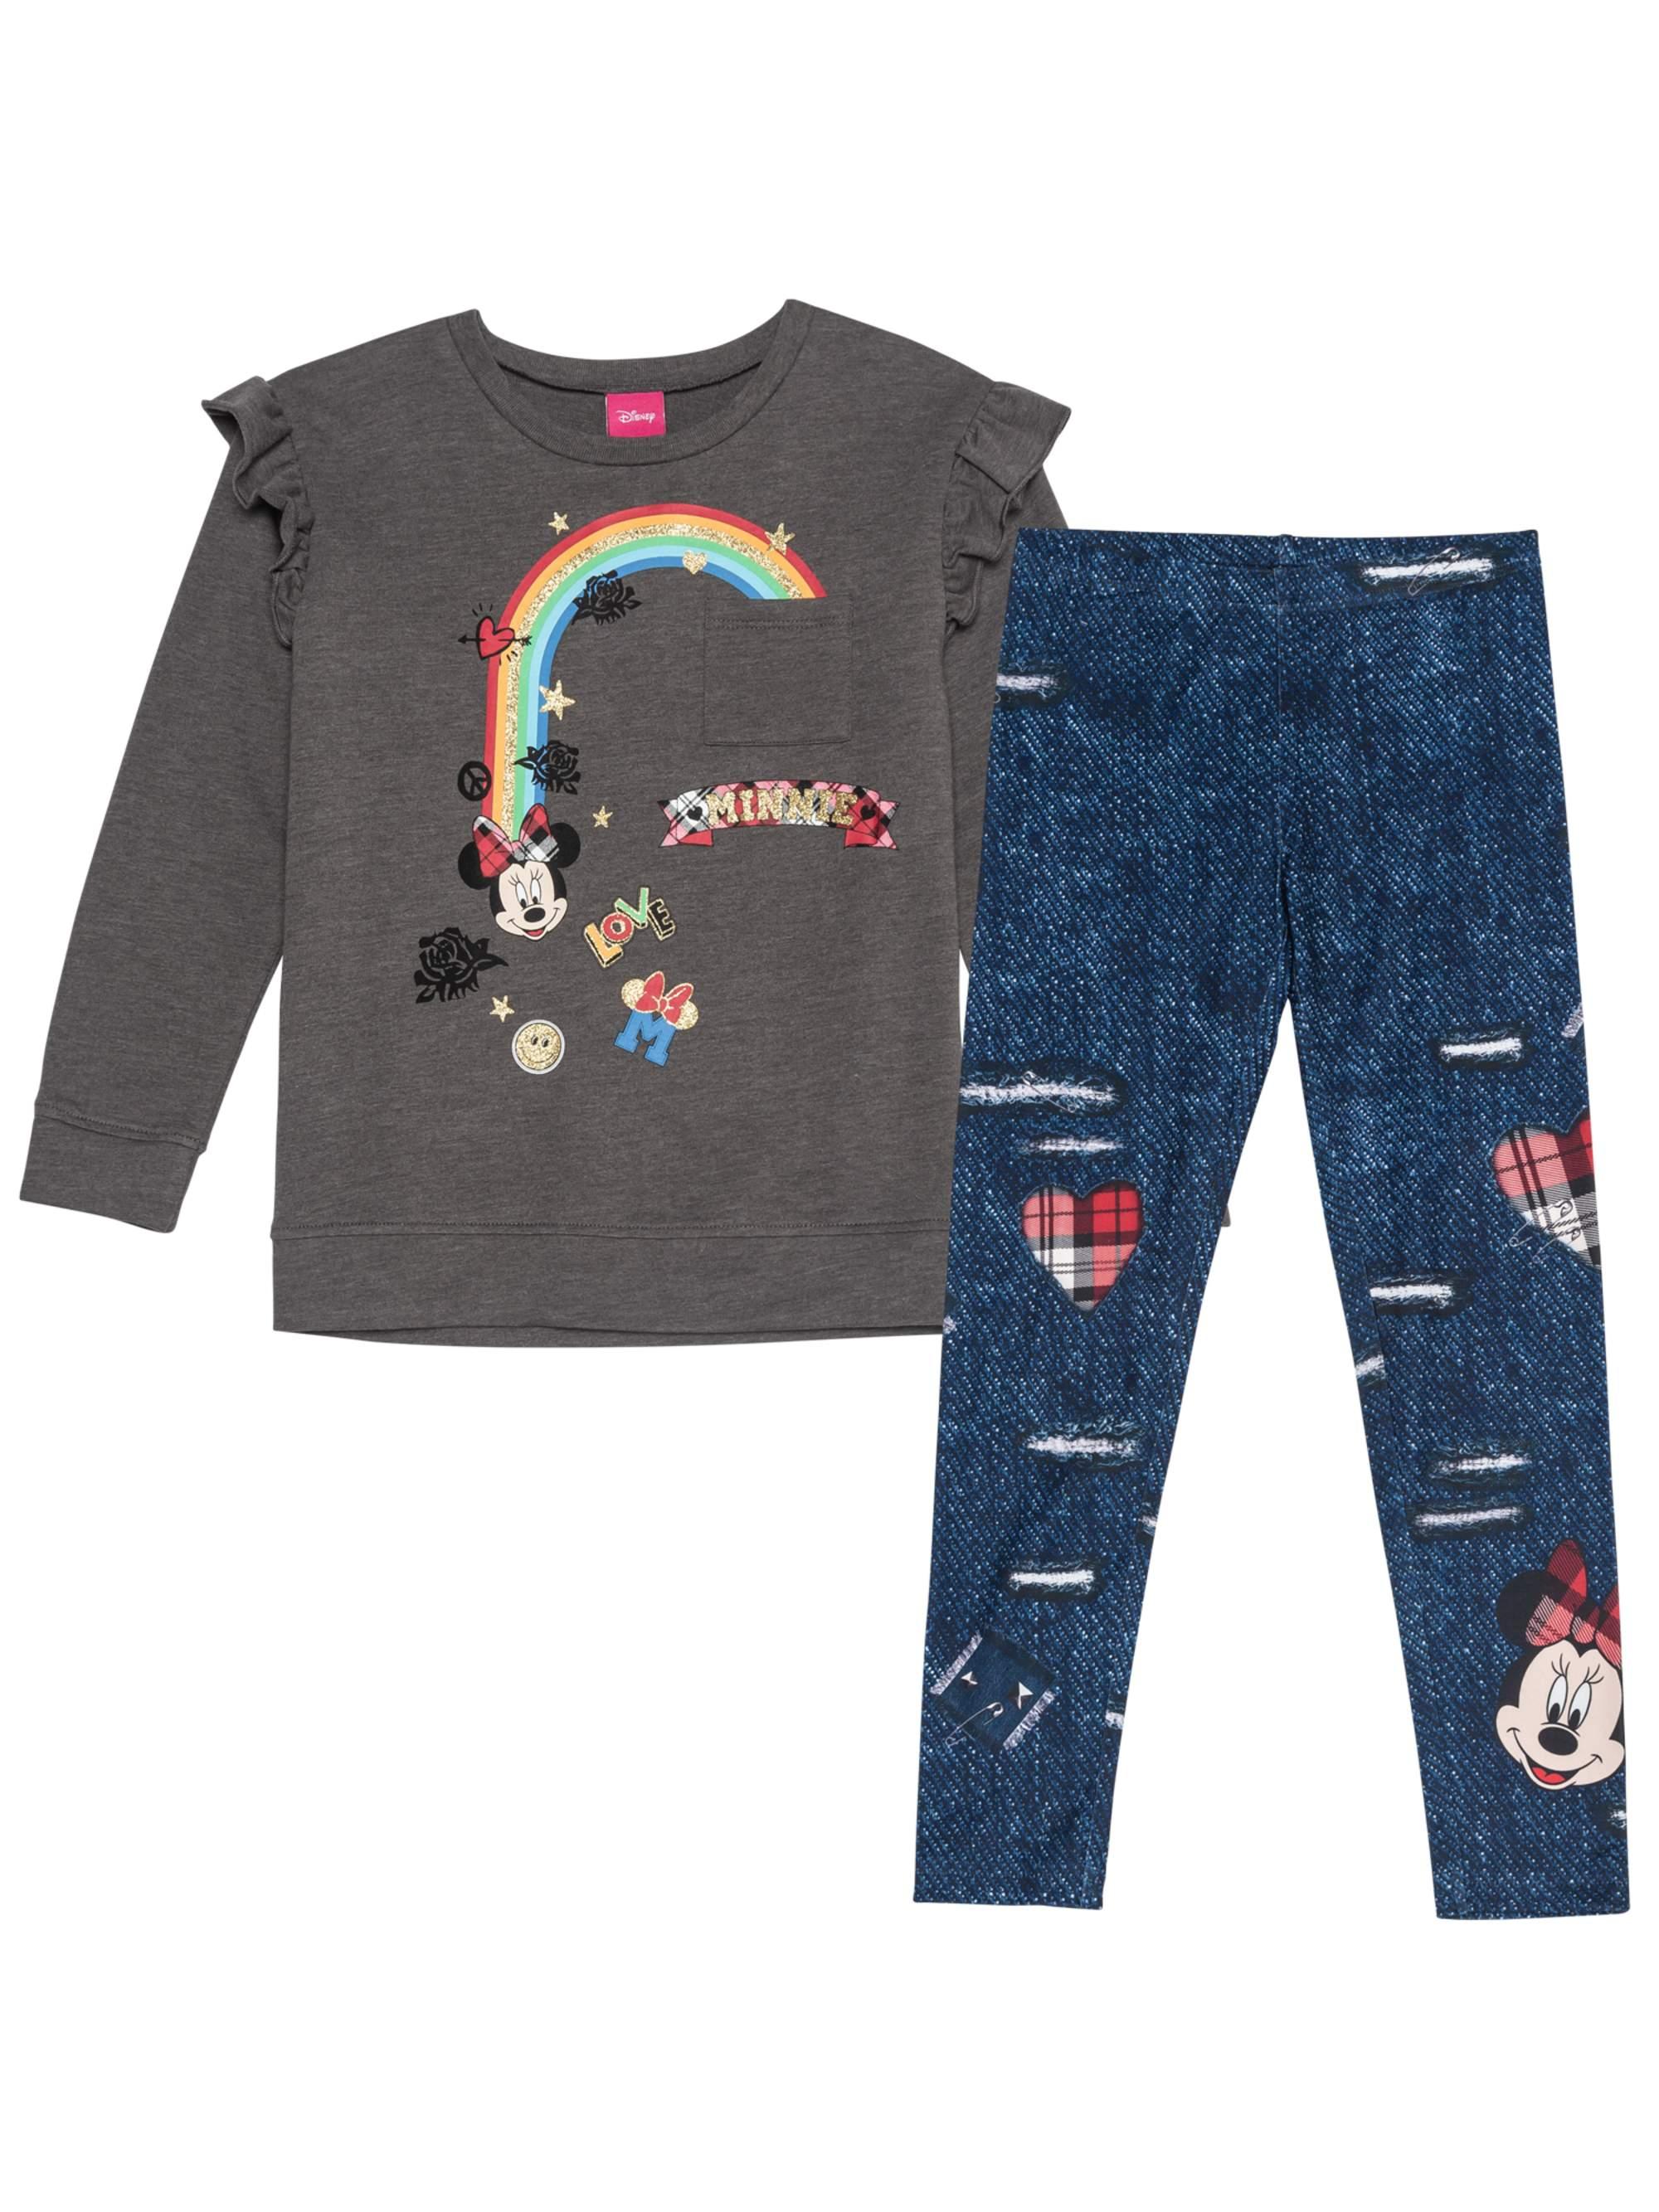 Rainbow Ruffle Sleeve Top and Legging, 2-Piece Outfit Set (Little Girls & Big Girls)